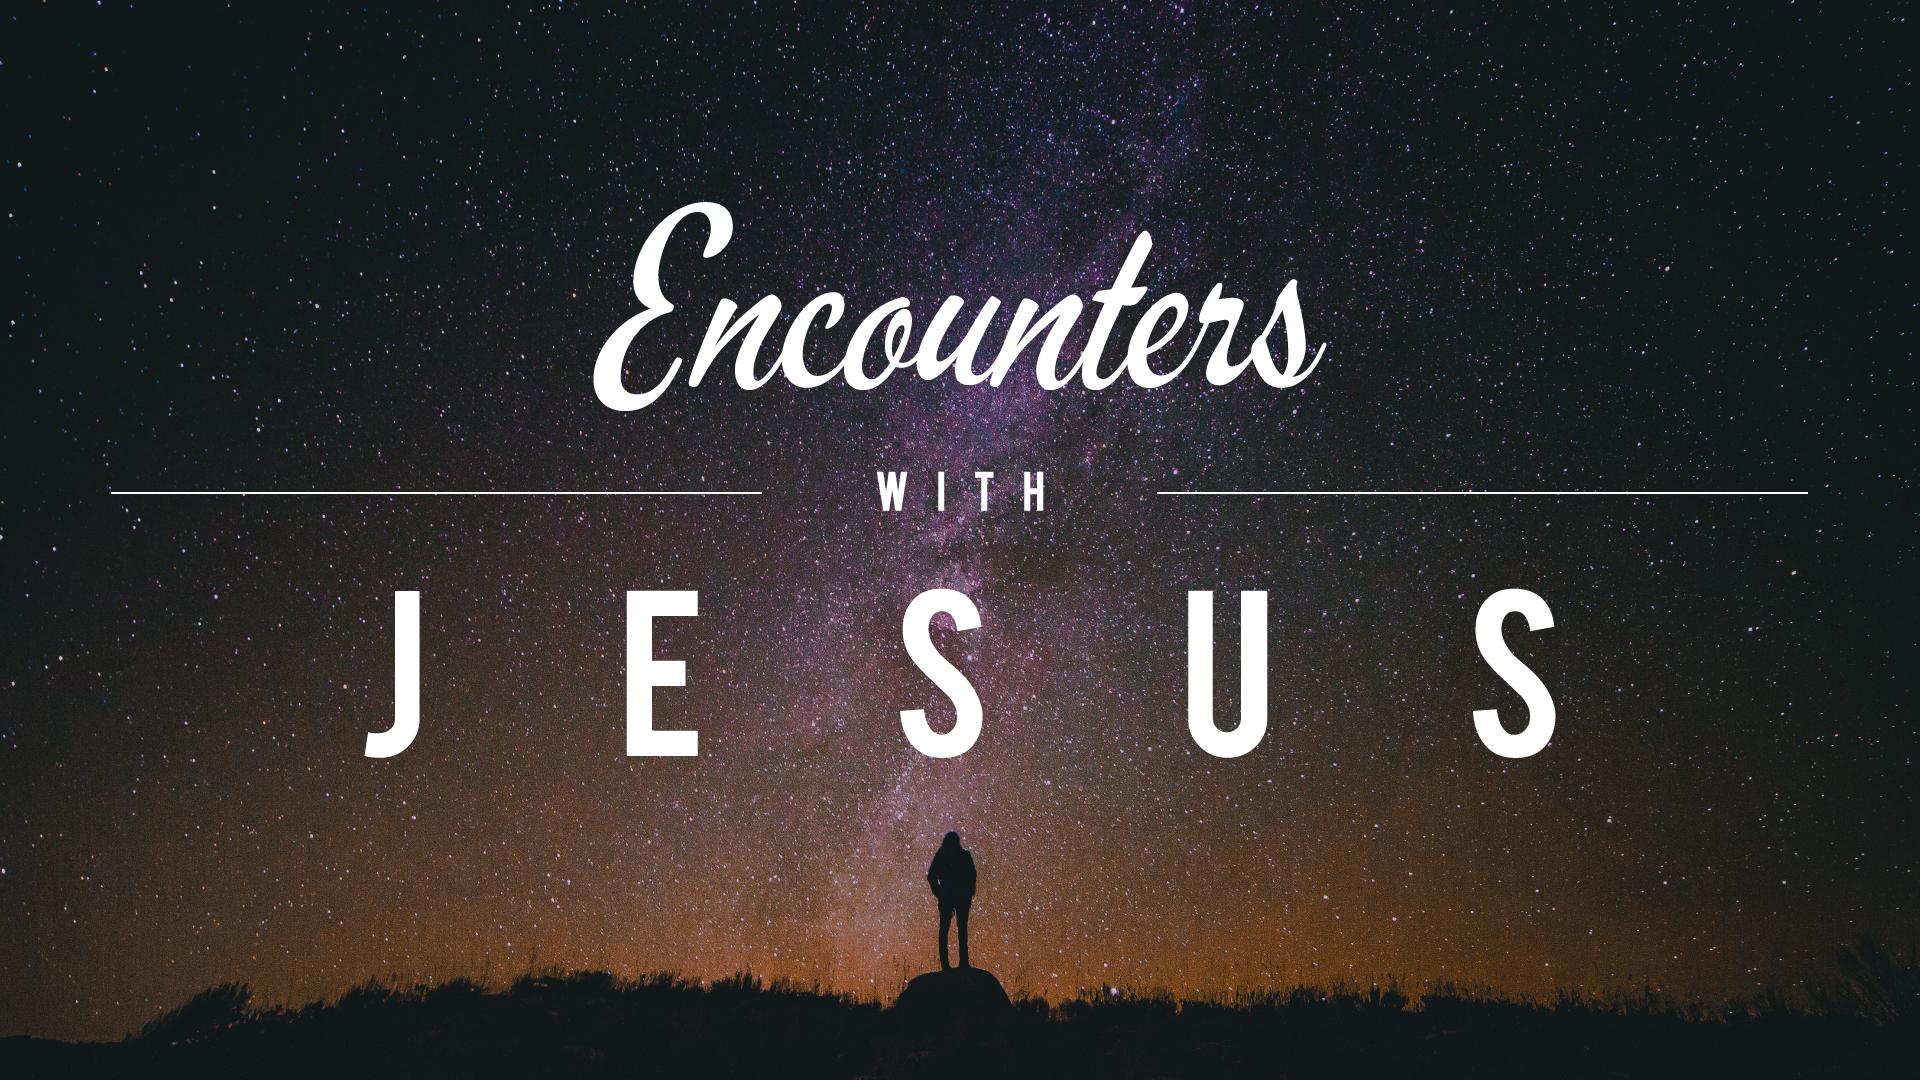 Encounters-with-Jesus-Background.jpg